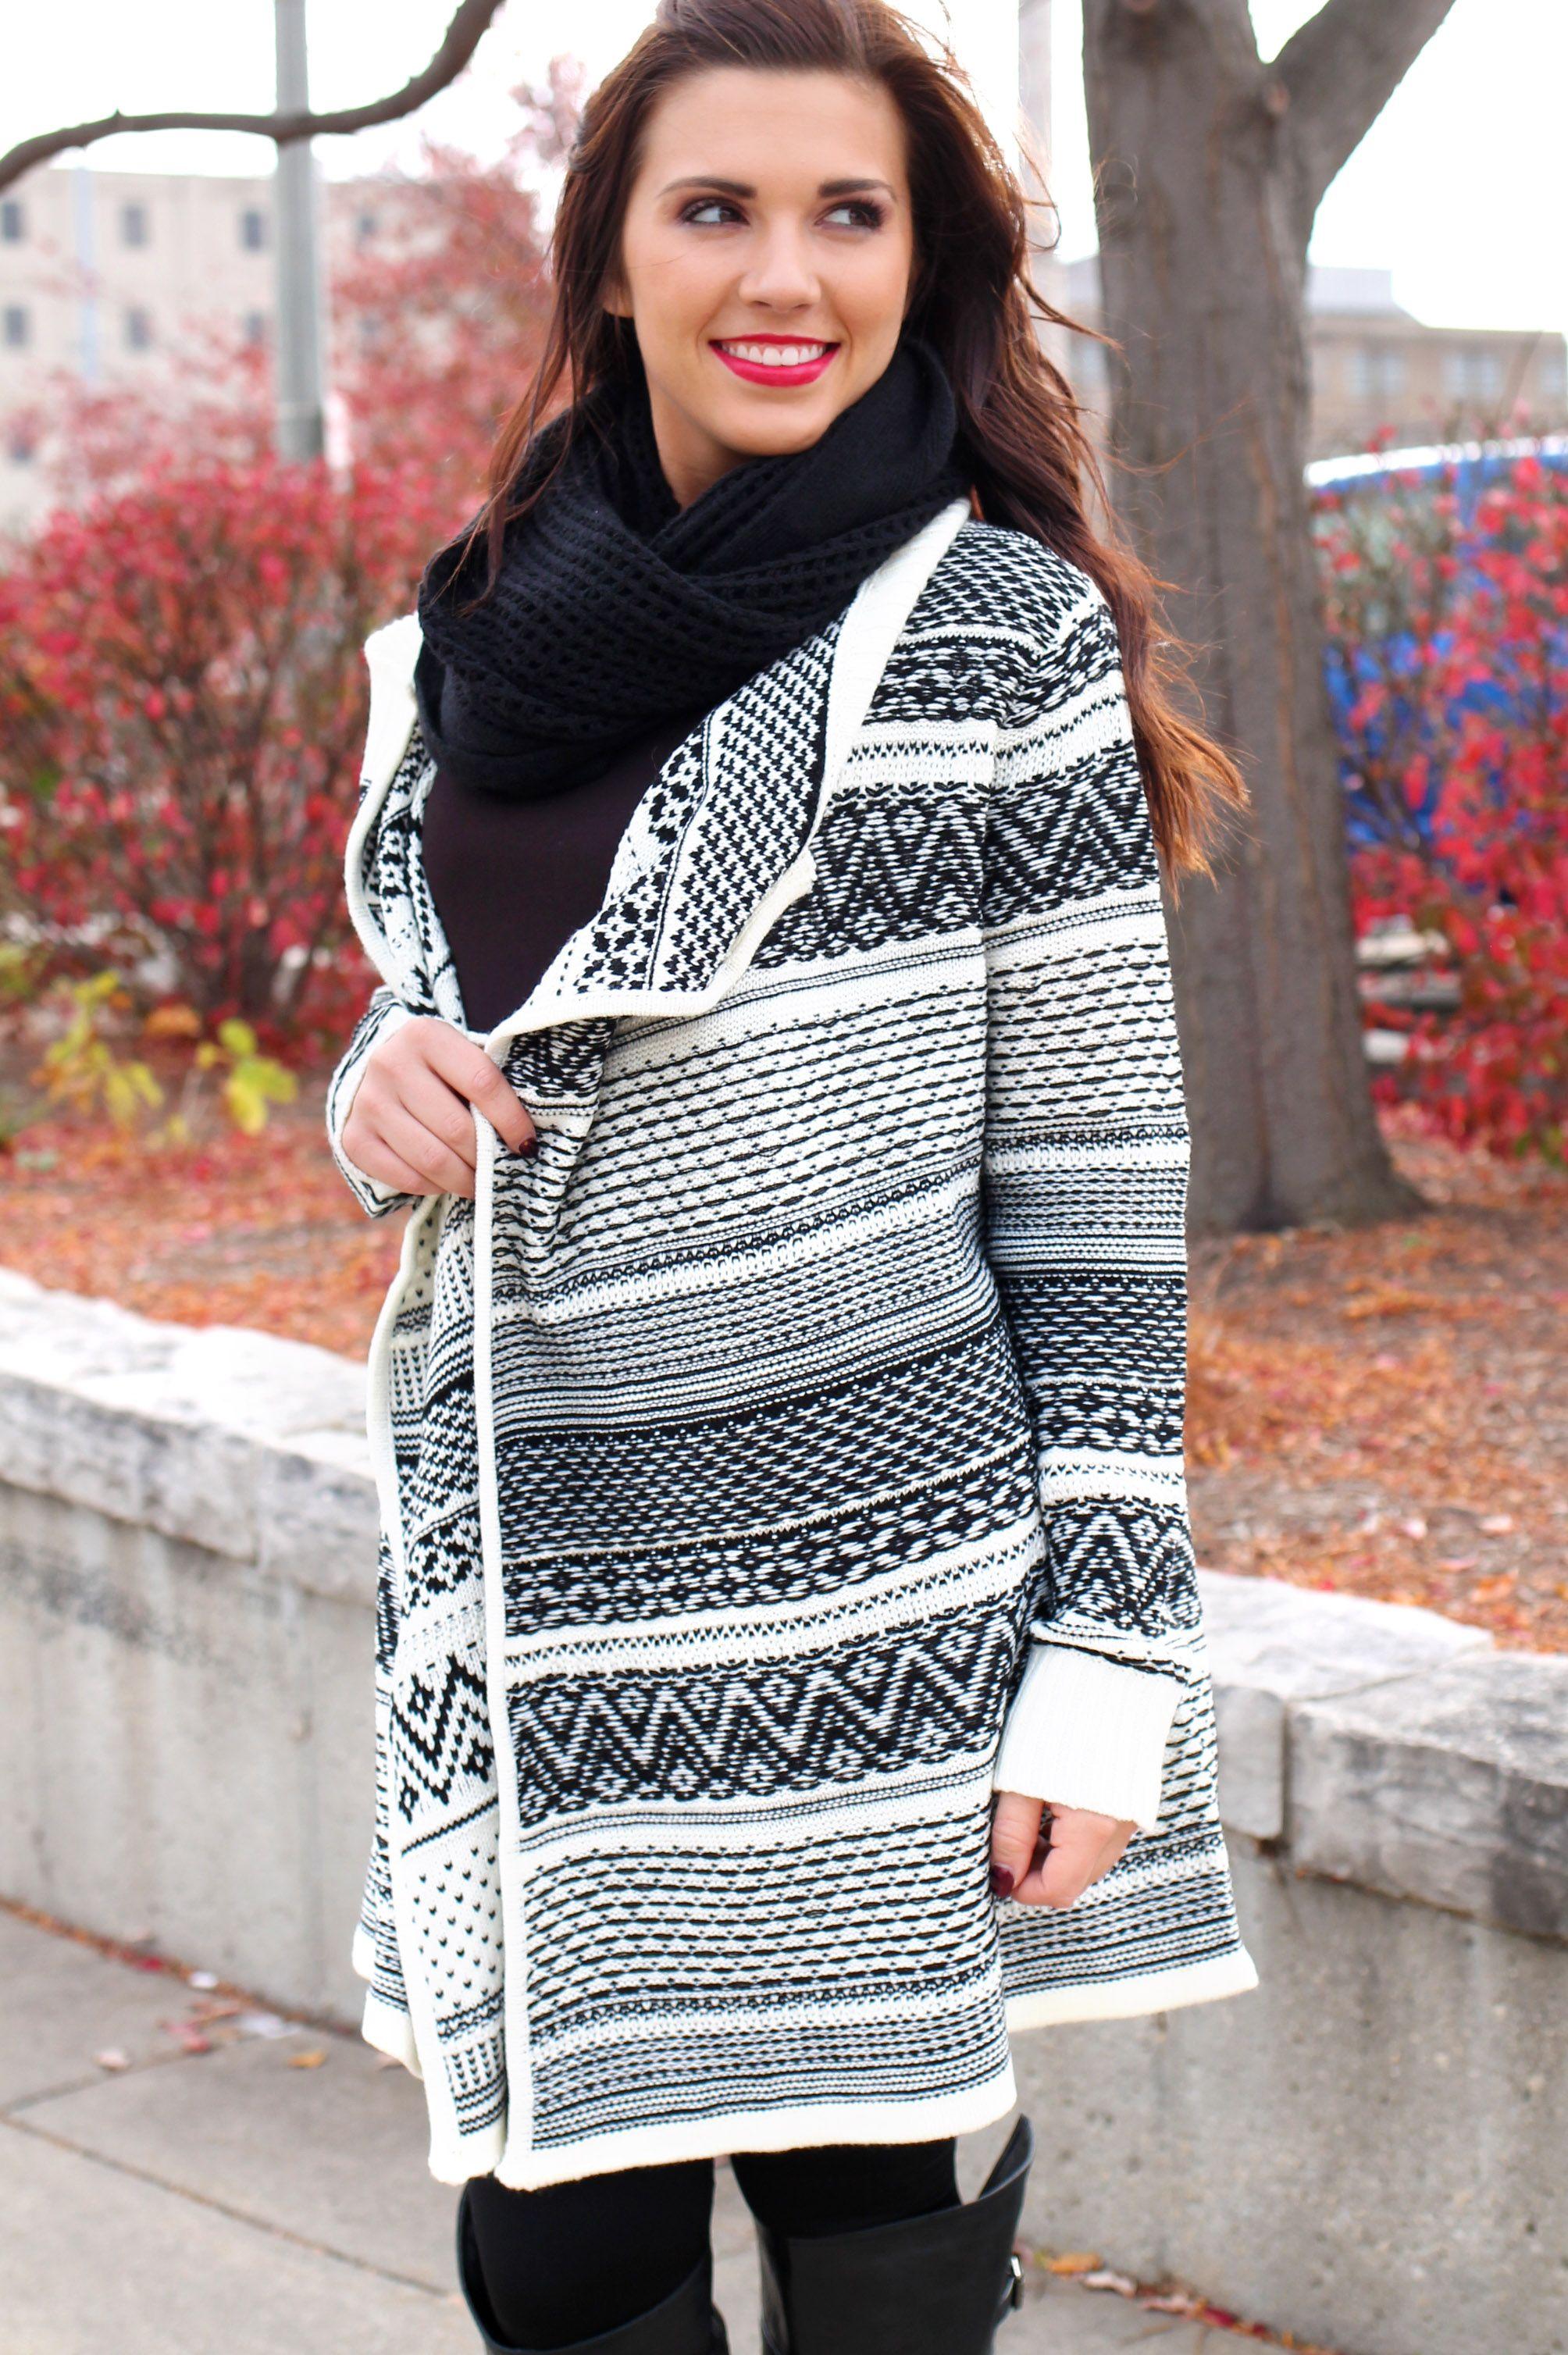 Black and White Oversized Knit Cardigan